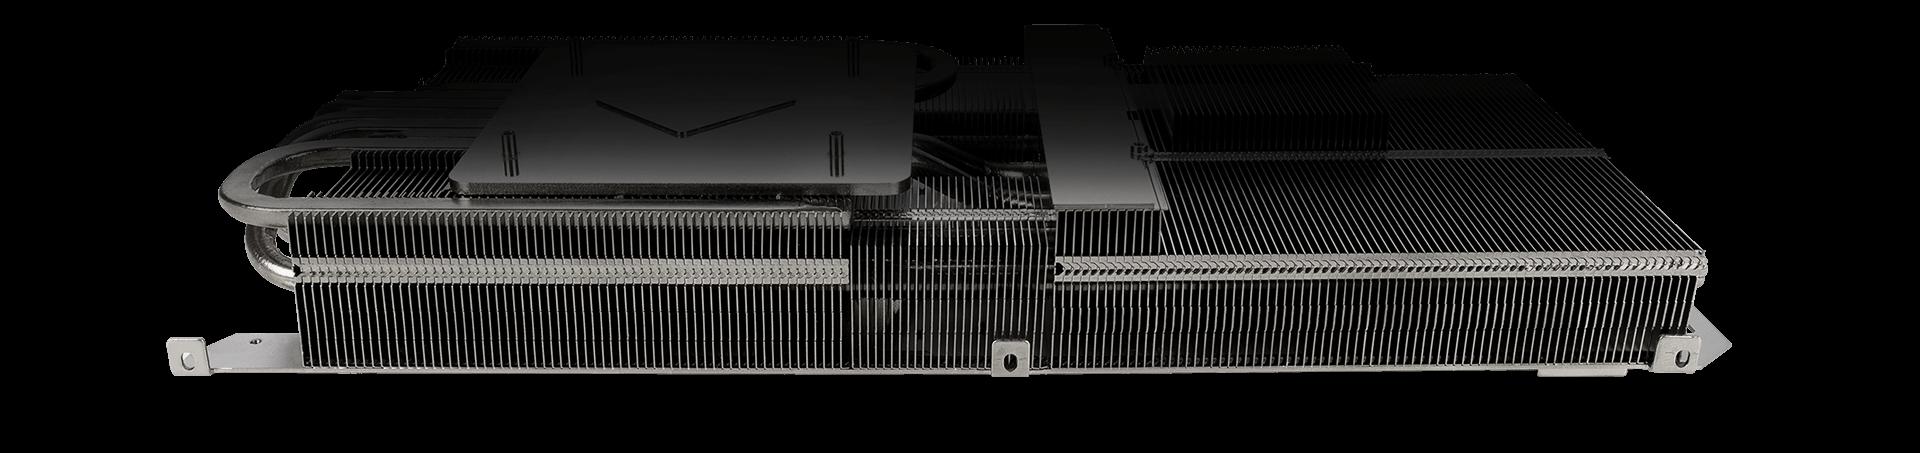 Radeon ™ RX 6700 XT